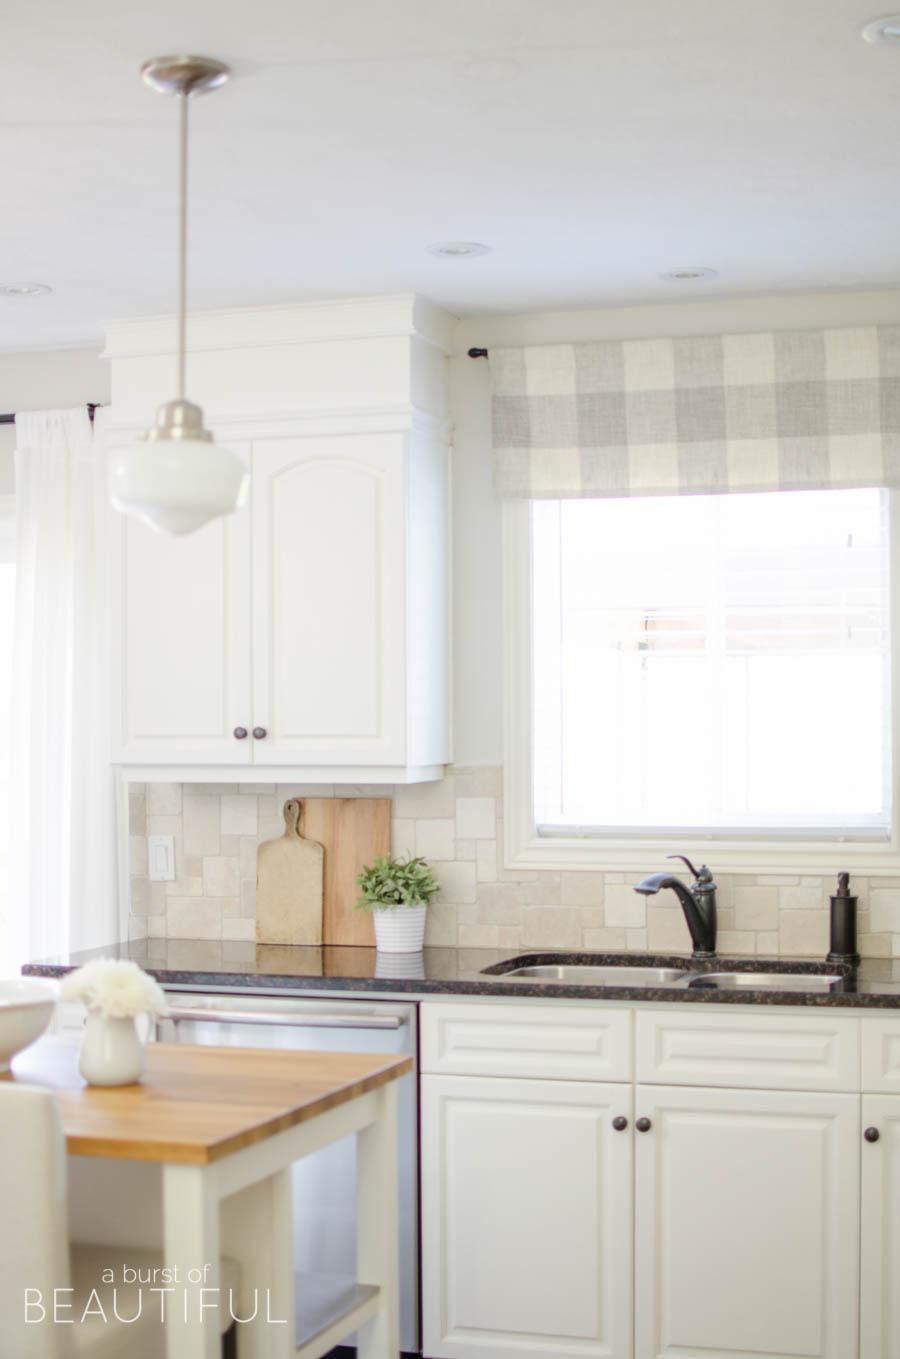 Farmhouse Kitchen Window Valance Tutorial | Nick + Alicia